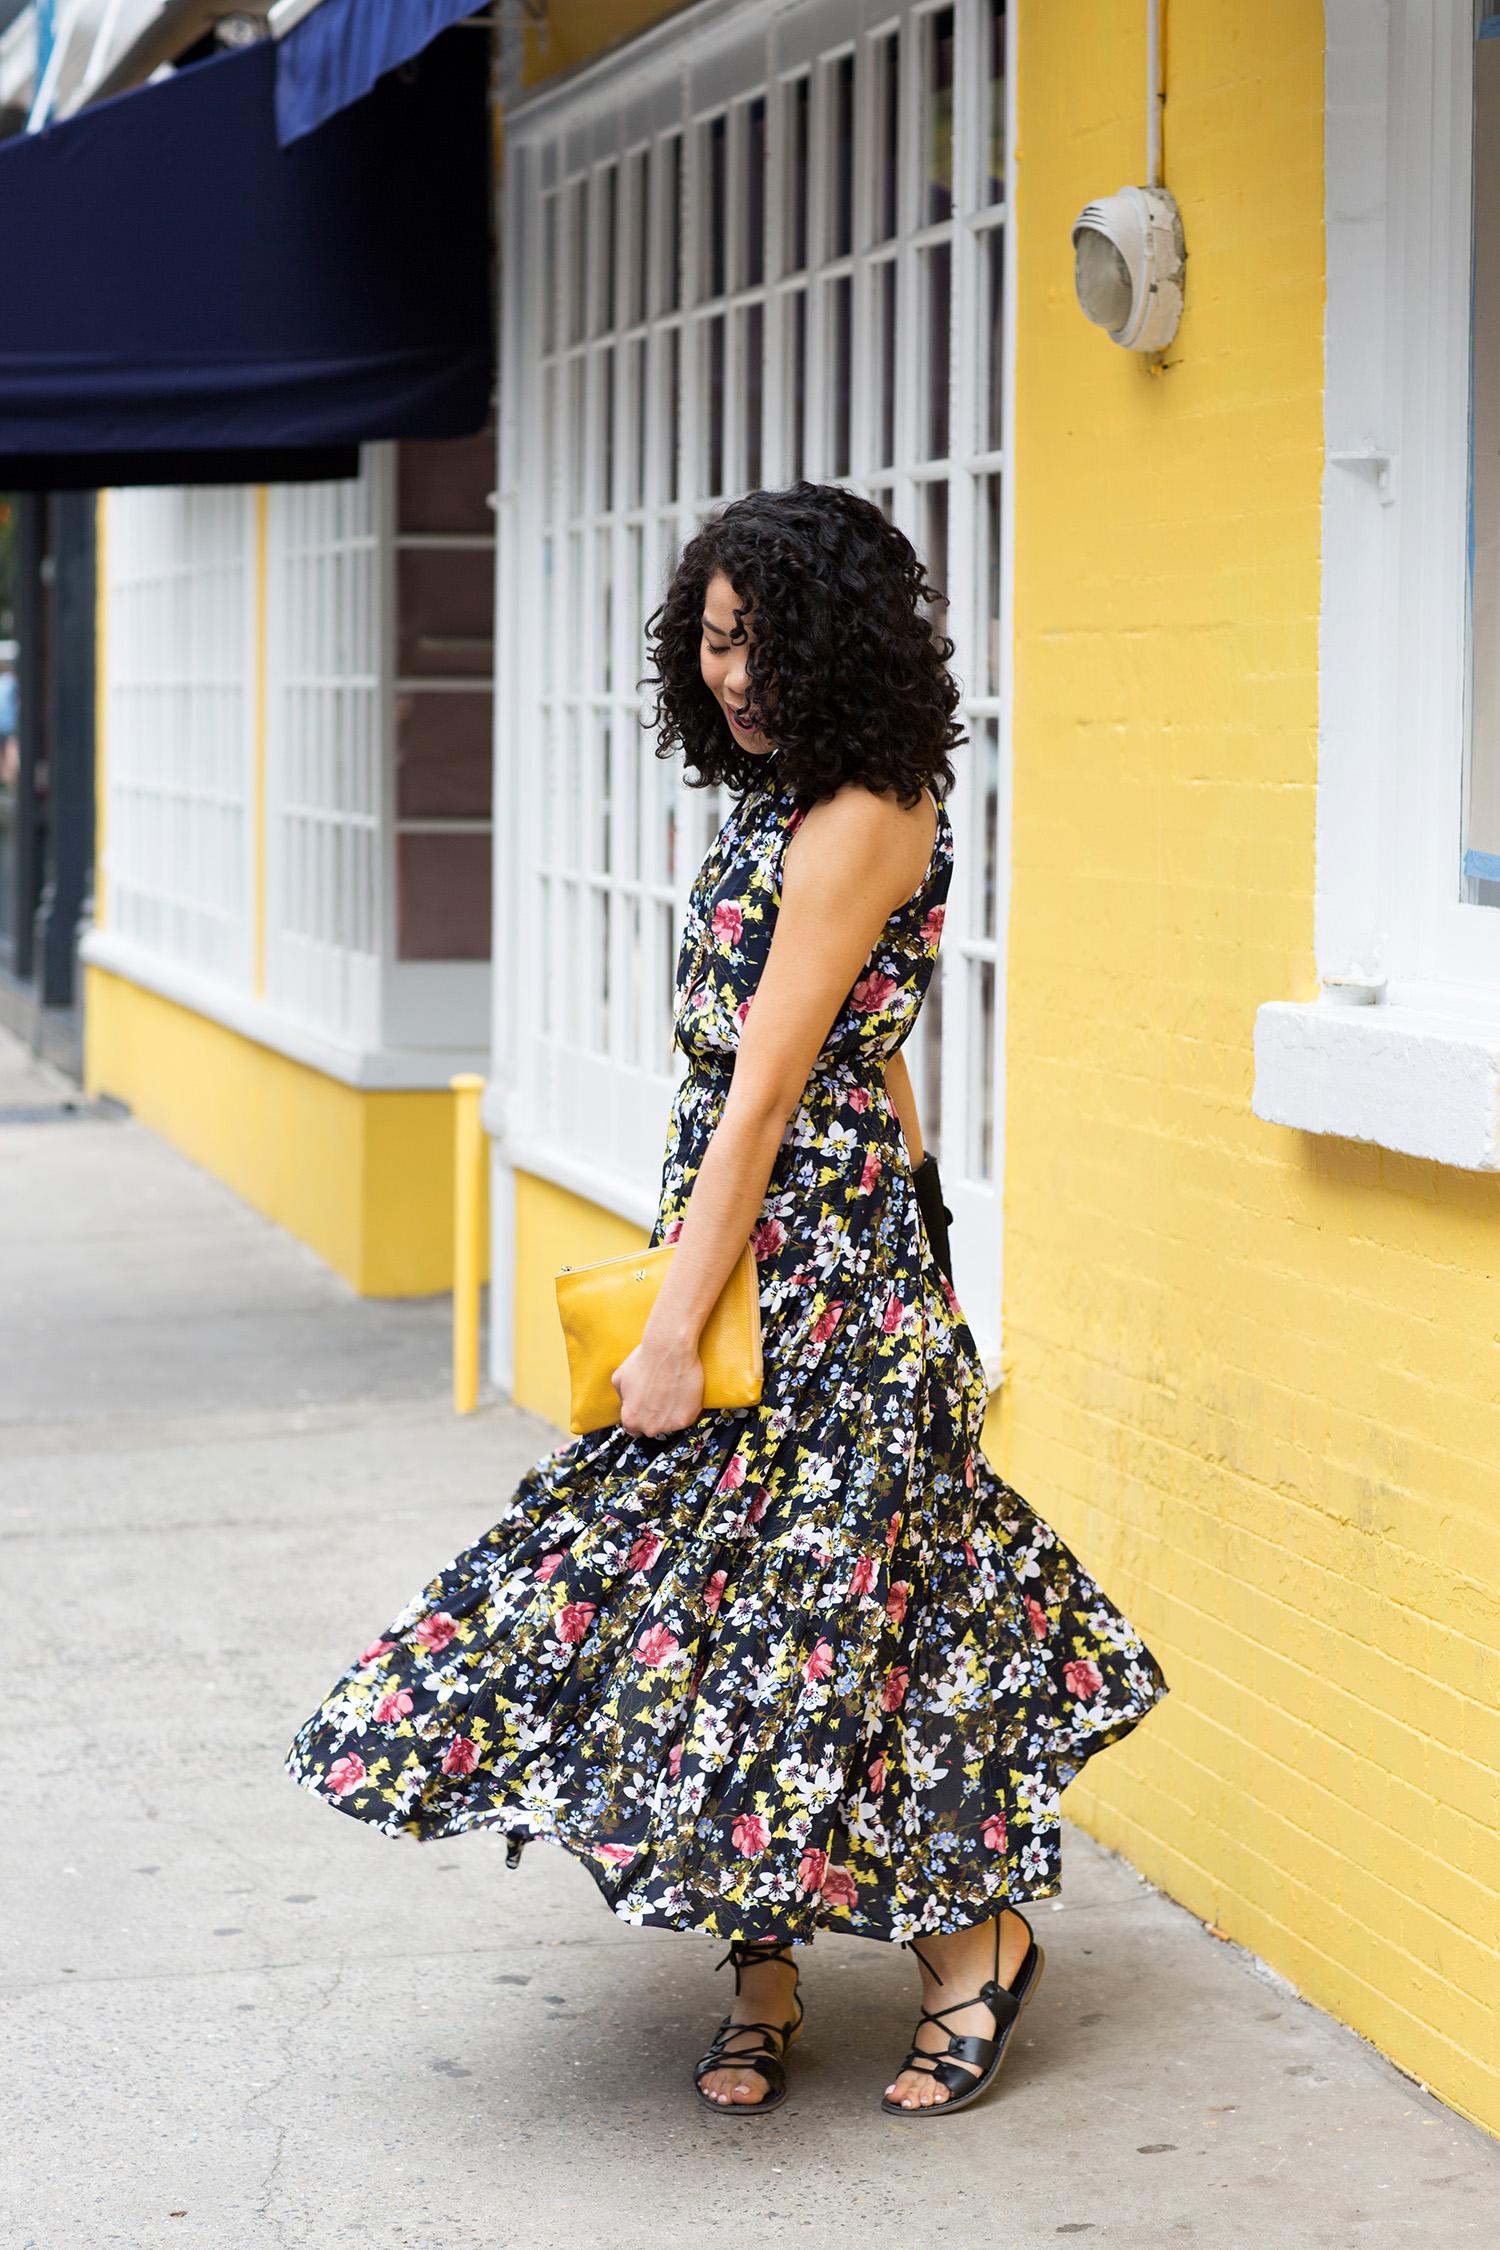 banana_republic_floral_dress.jpg